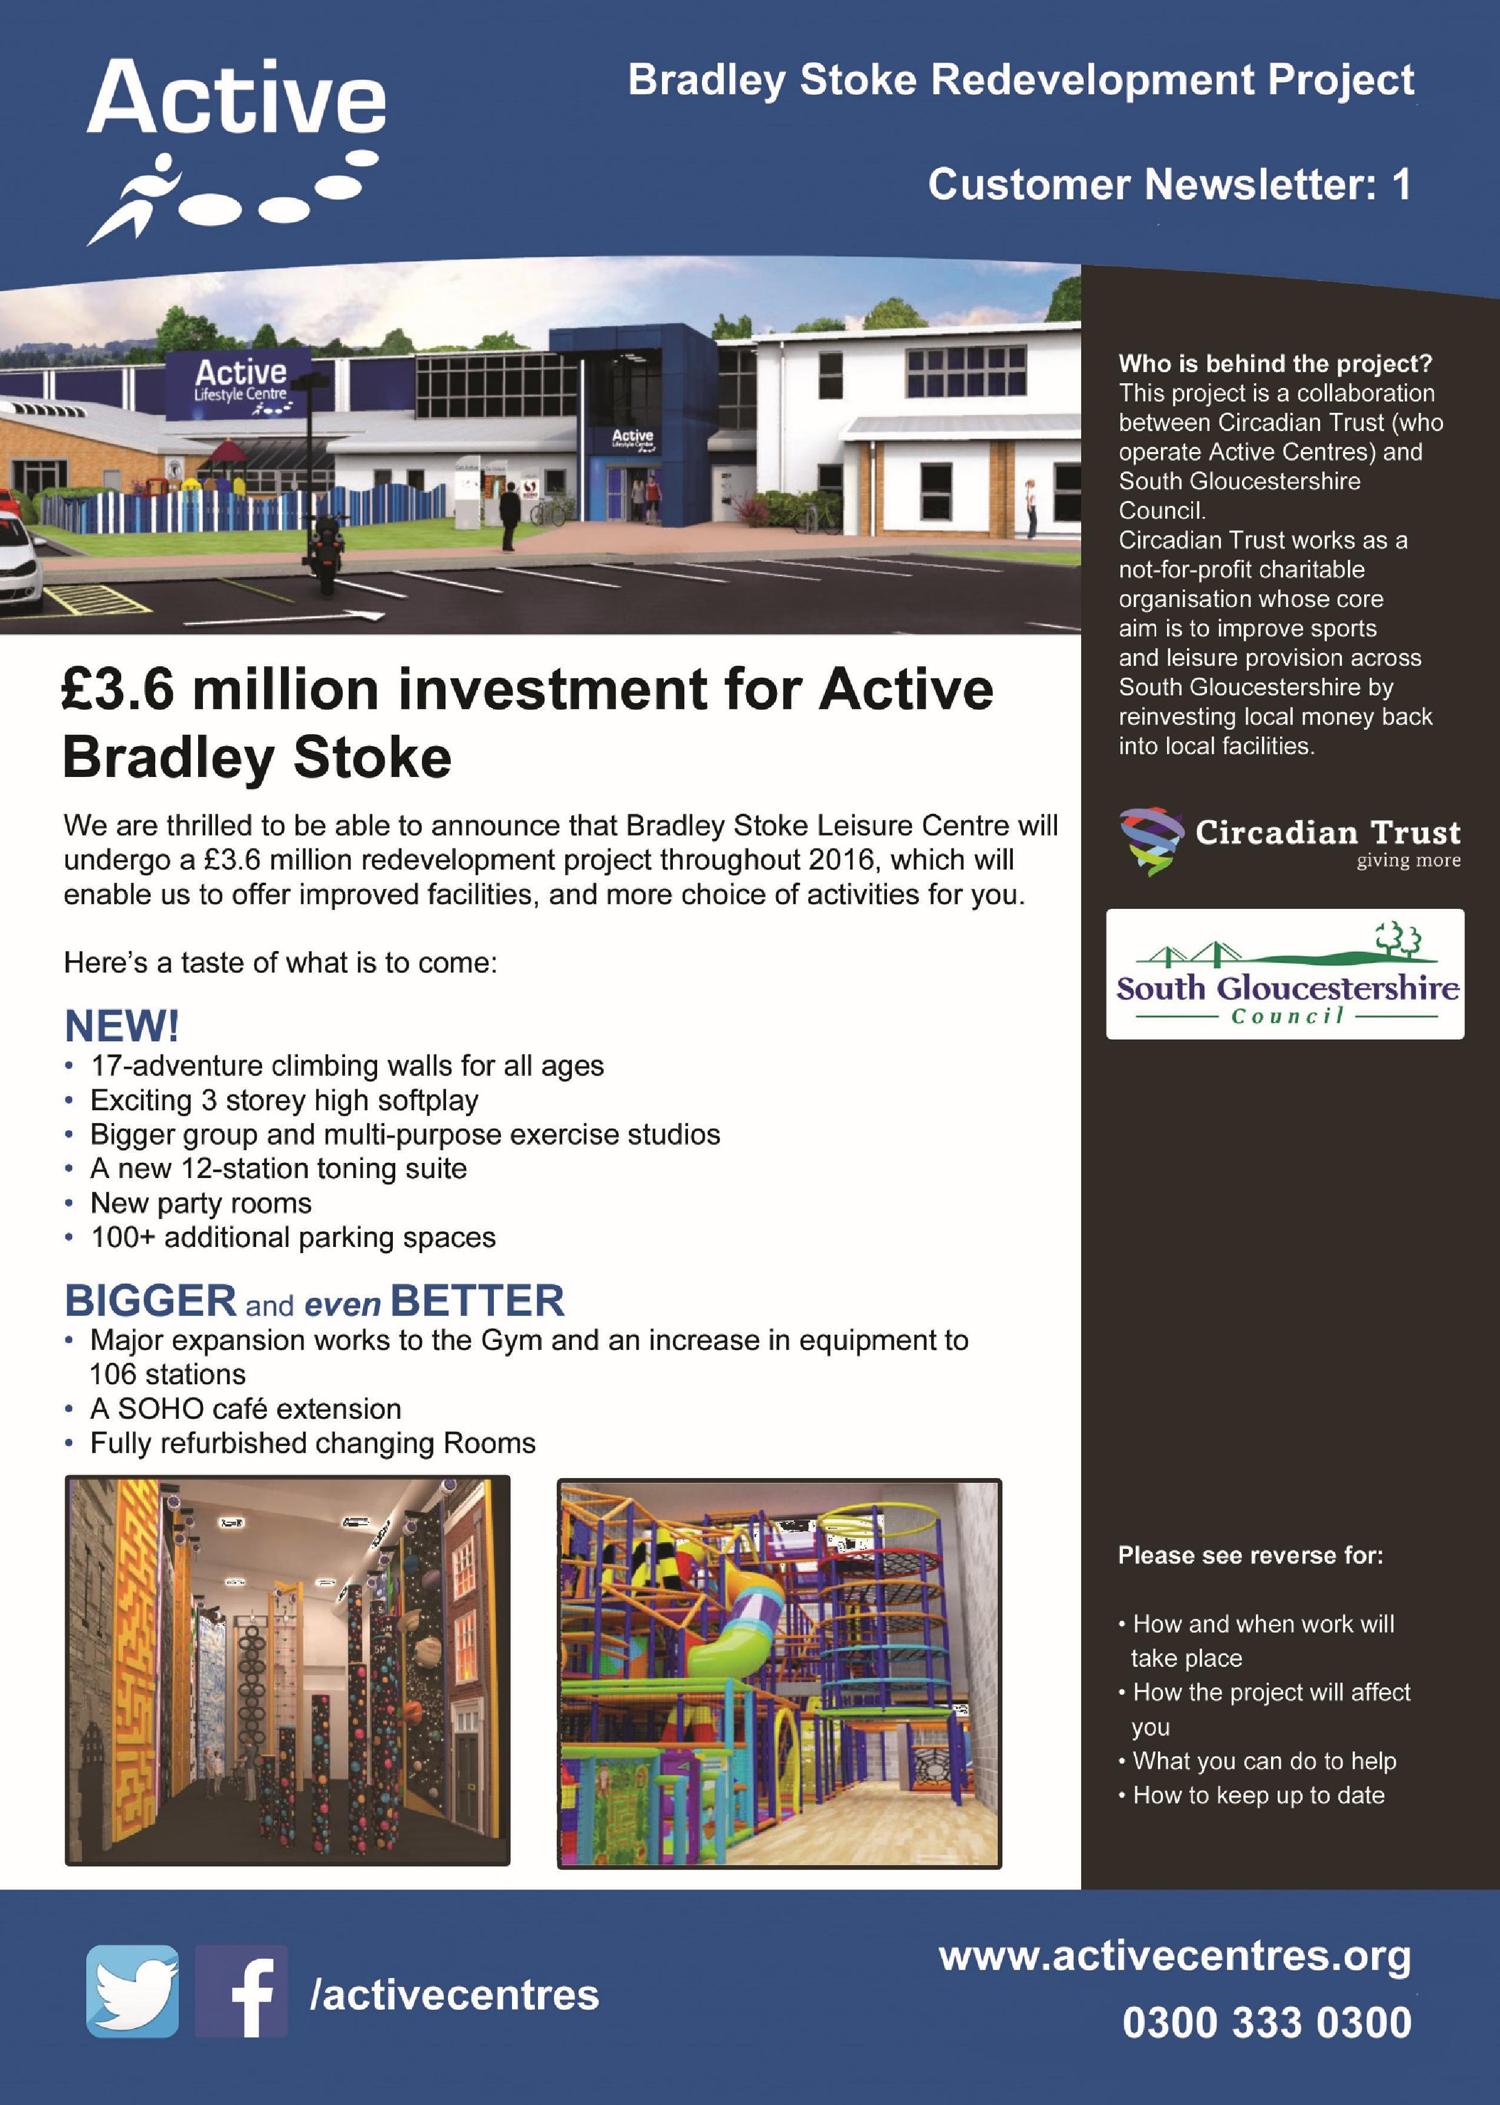 Bradley-Stoke-Redevelopment-Project-Customer-Newsletter1-1